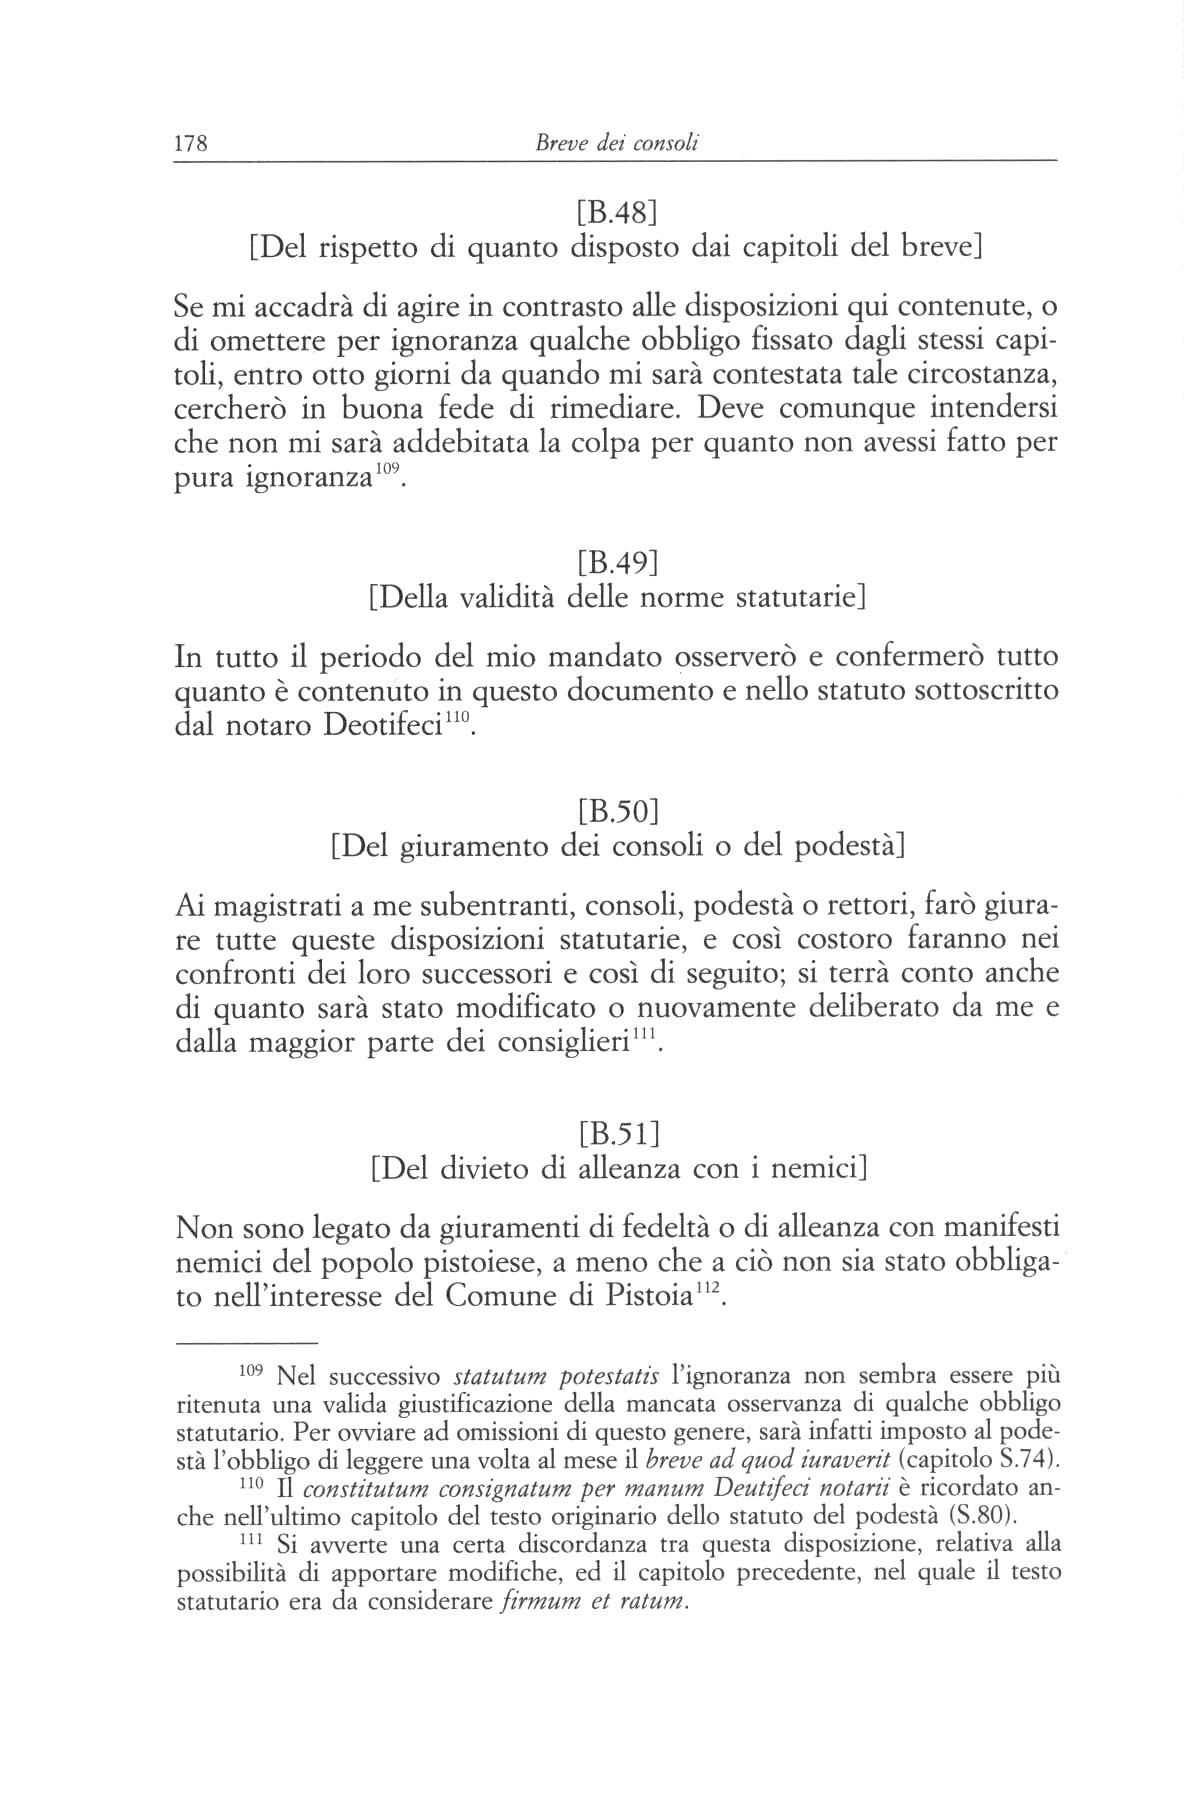 statuti pistoiesi del sec.XII 0178.jpg